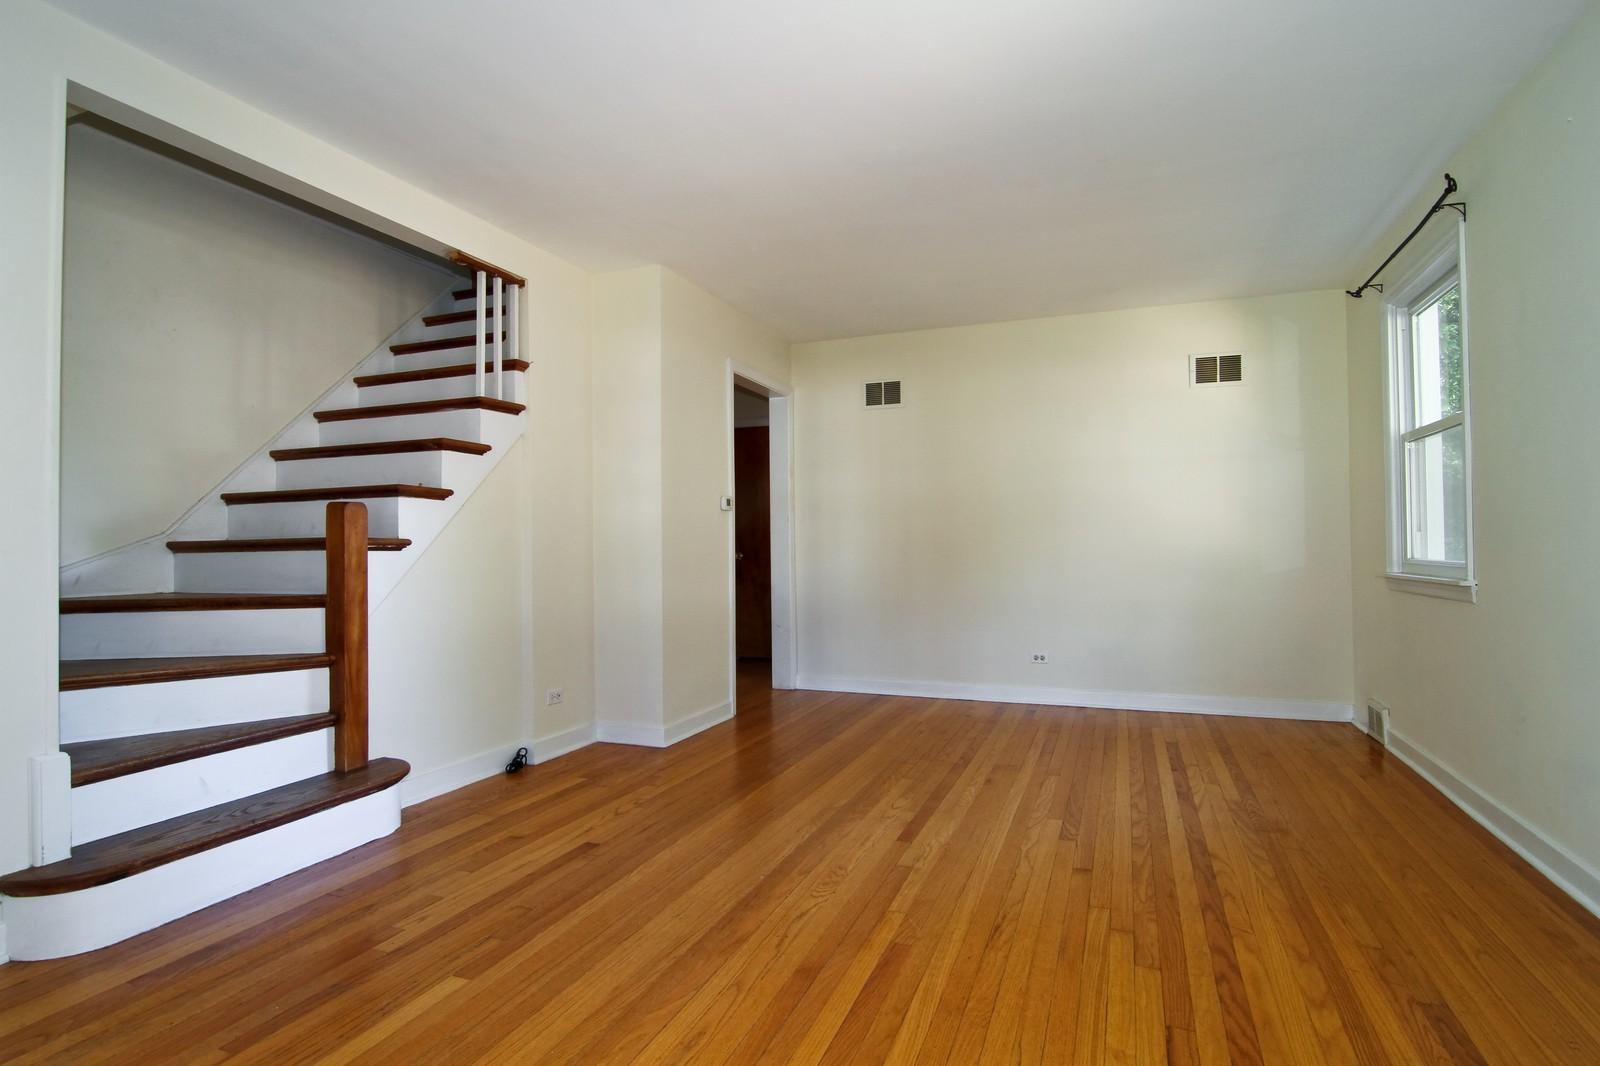 Real Estate Photography - 1702 E Indiana St, Wheaton, IL, 60187 - Living Room